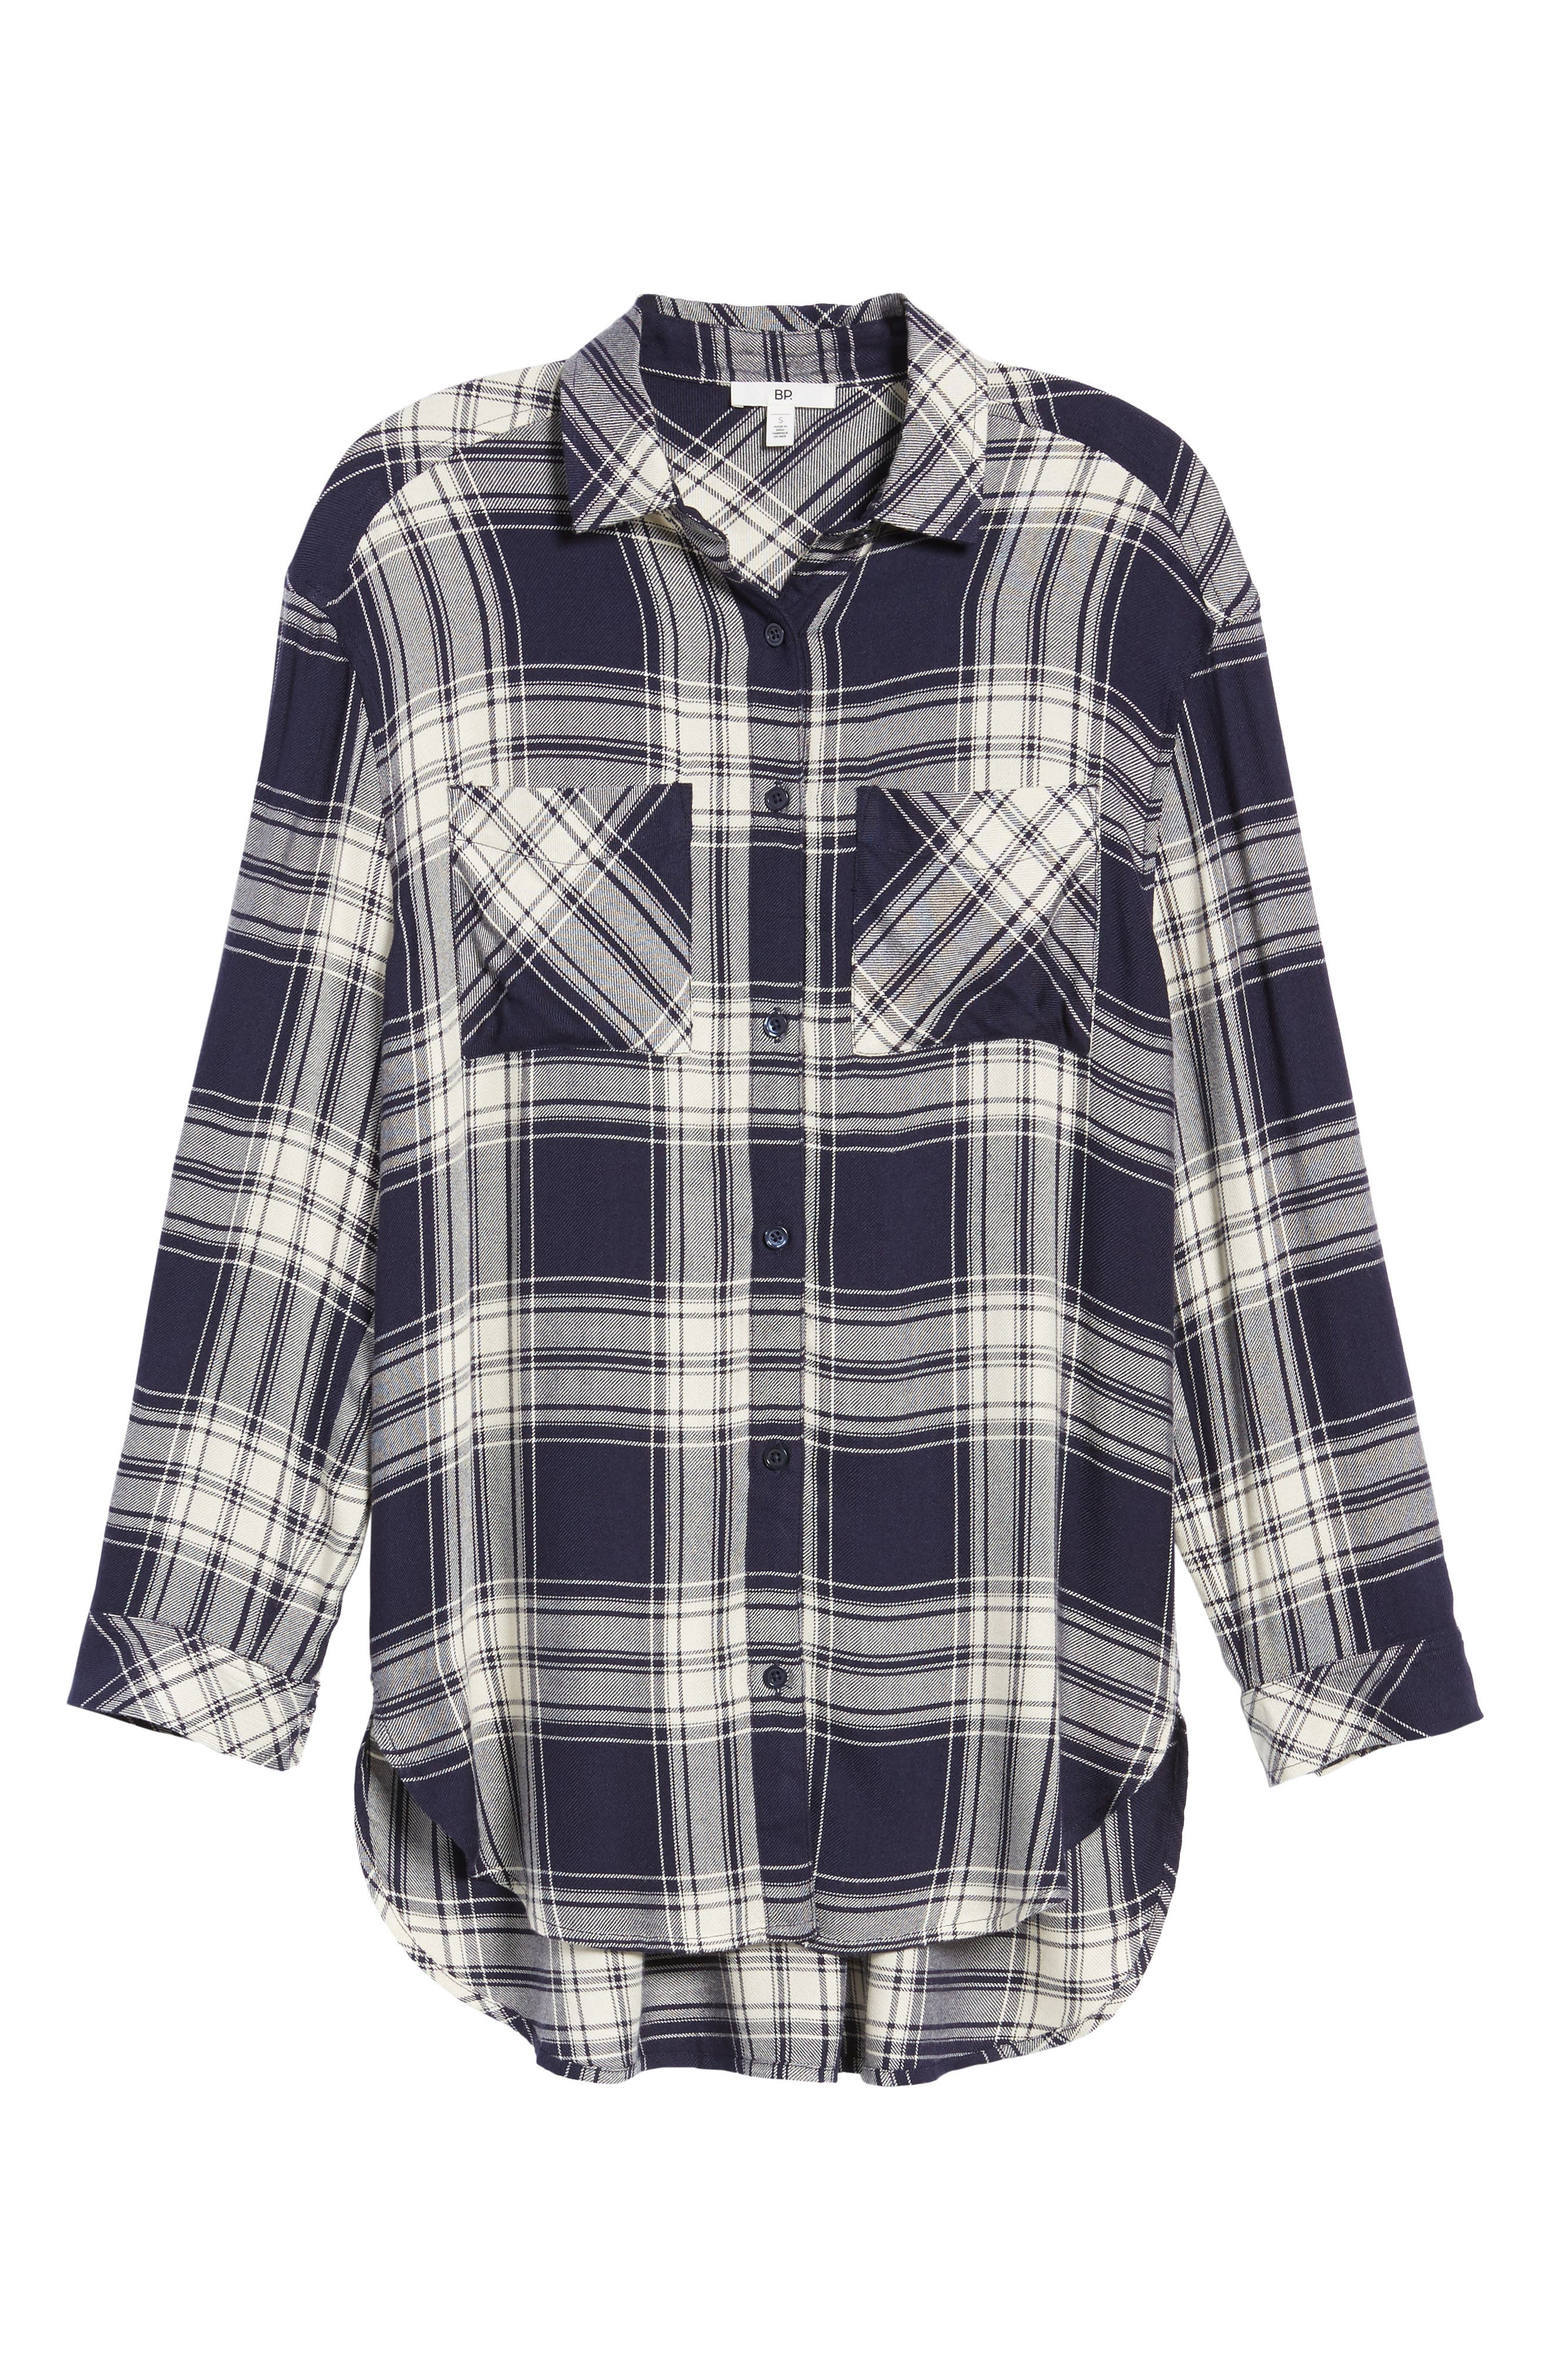 Oversize Flannel Shirt,                             Alternate thumbnail 6, color,                             Navy Peacoat Rose Plaid